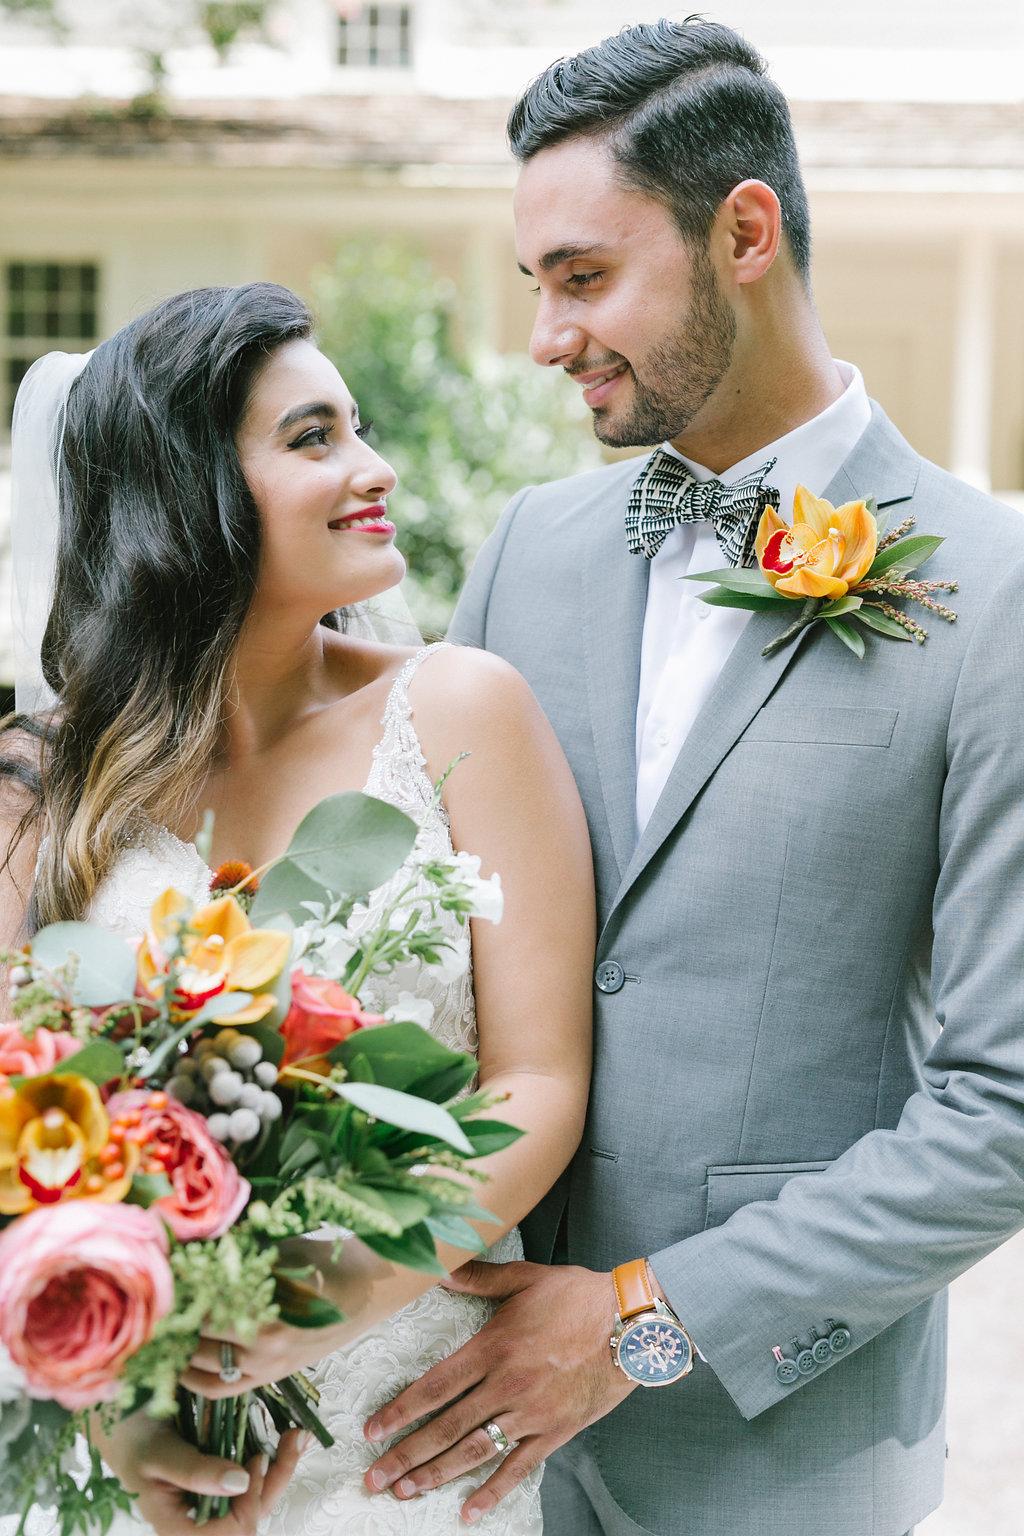 weddings with tropical color schemes - https://ruffledblog.com/vibrant-atlanta-wedding-inspiration-with-rust-accents